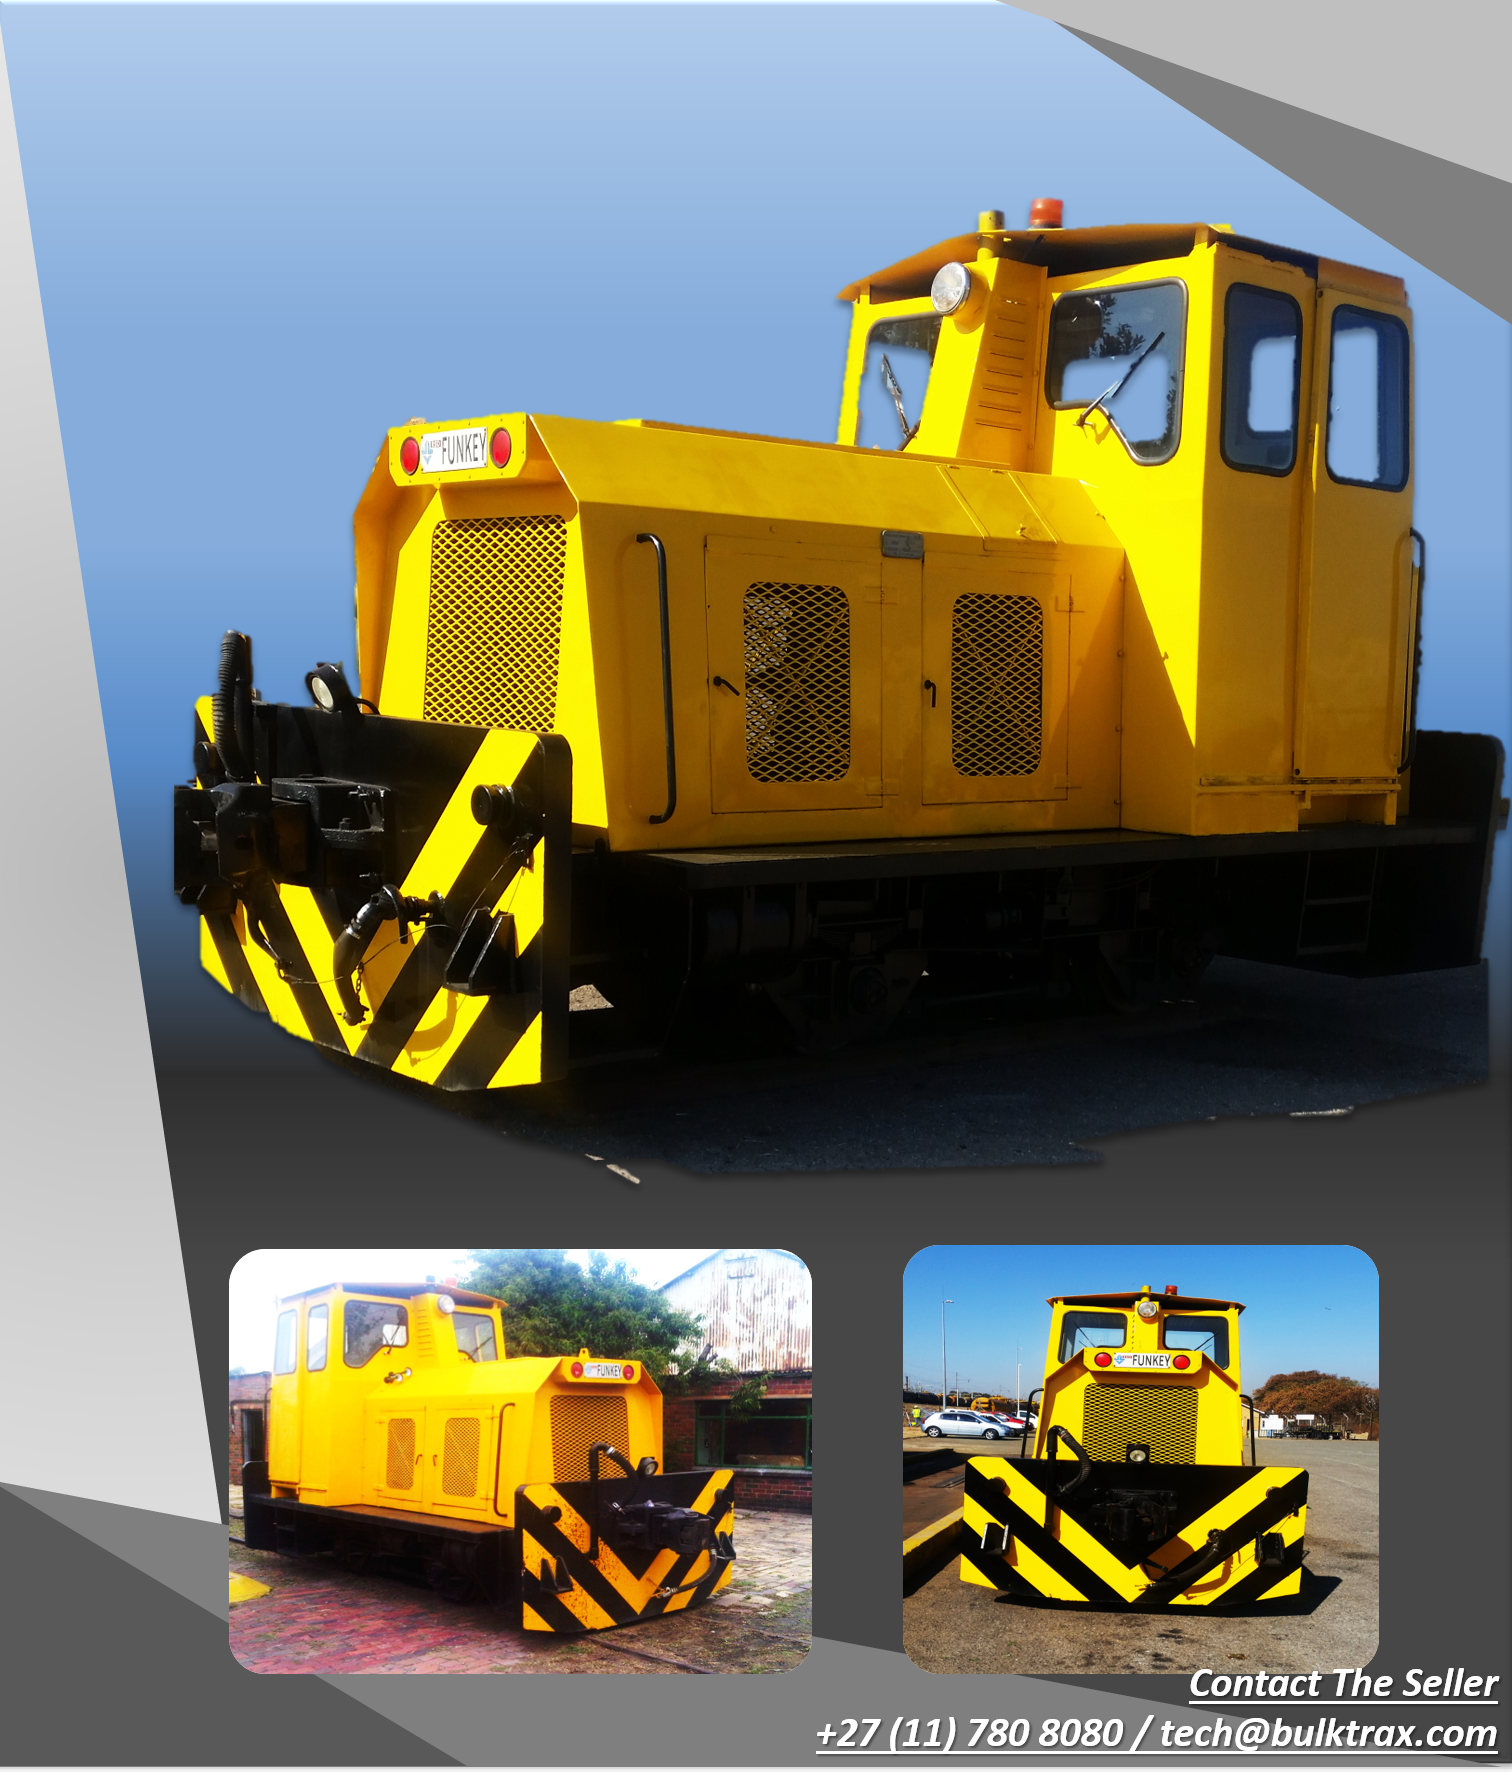 Shunting Locomotive For Sale